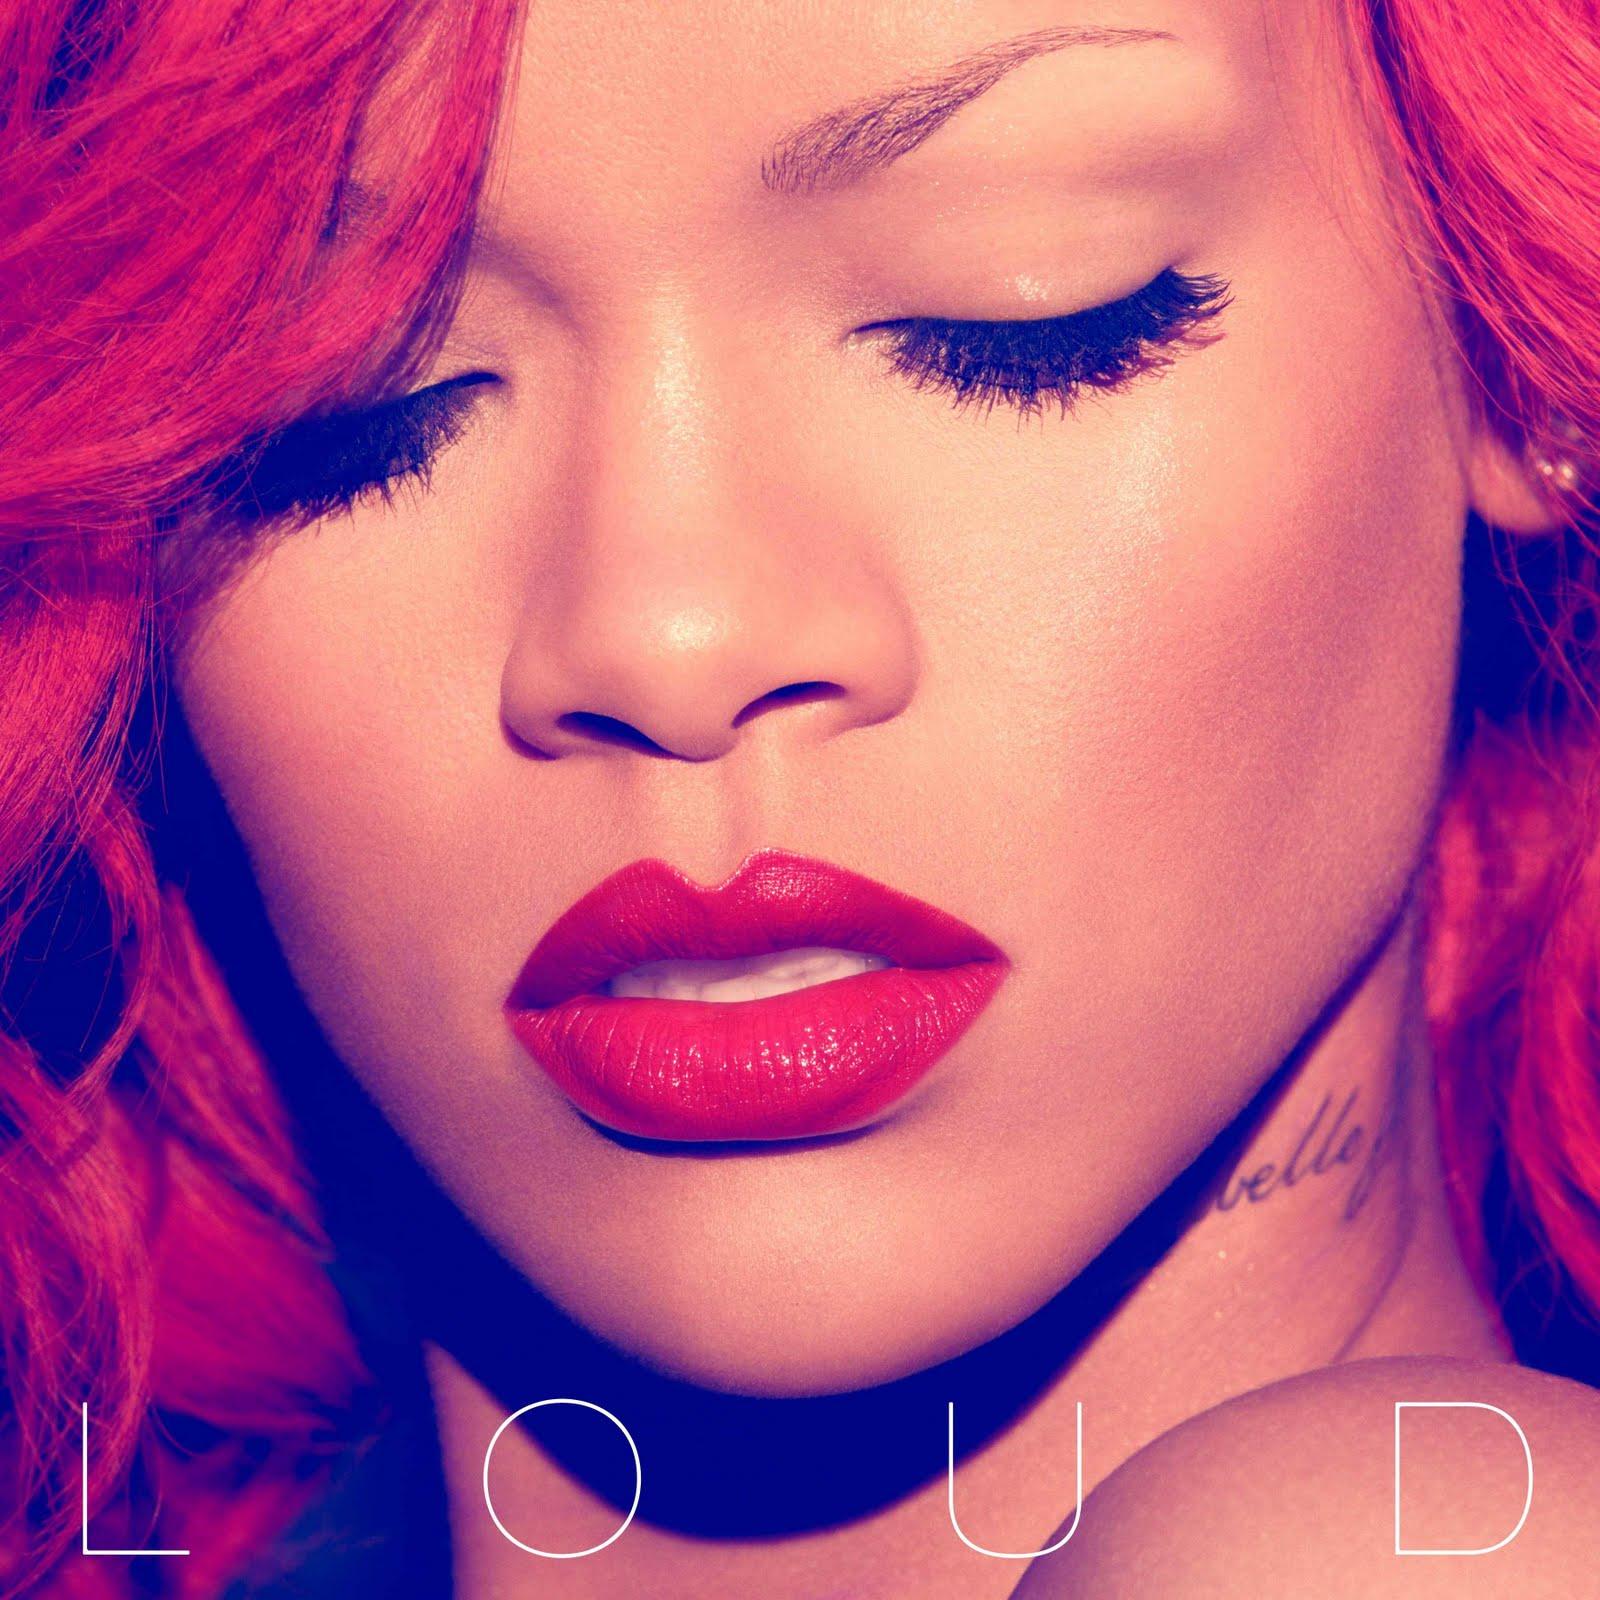 http://1.bp.blogspot.com/_6lV5hzNR1fU/TKuLySXWhhI/AAAAAAAAIyM/00EjE2oX5CY/s1600/Rihanna-Loud-Official-Album-Cover.jpg